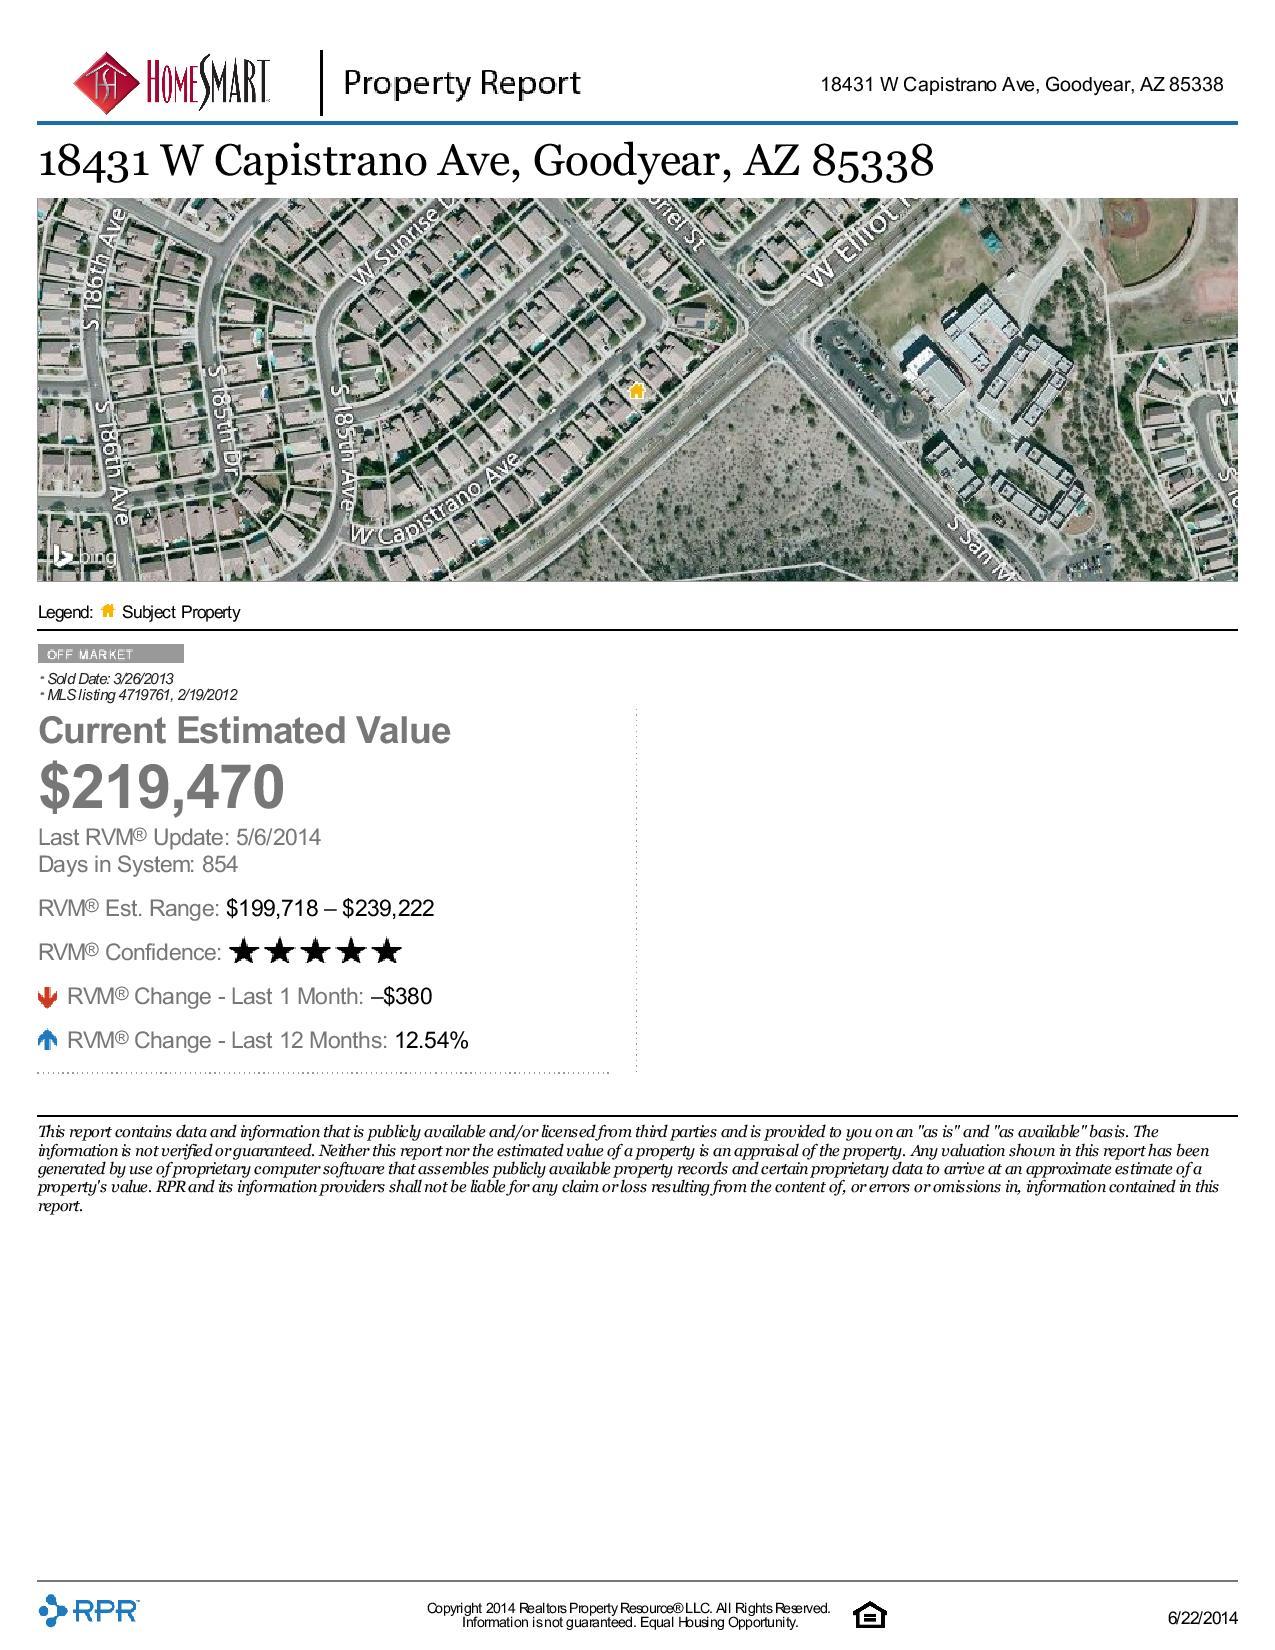 18431-W-Capistrano-Ave-Goodyear-AZ-85338-page-002